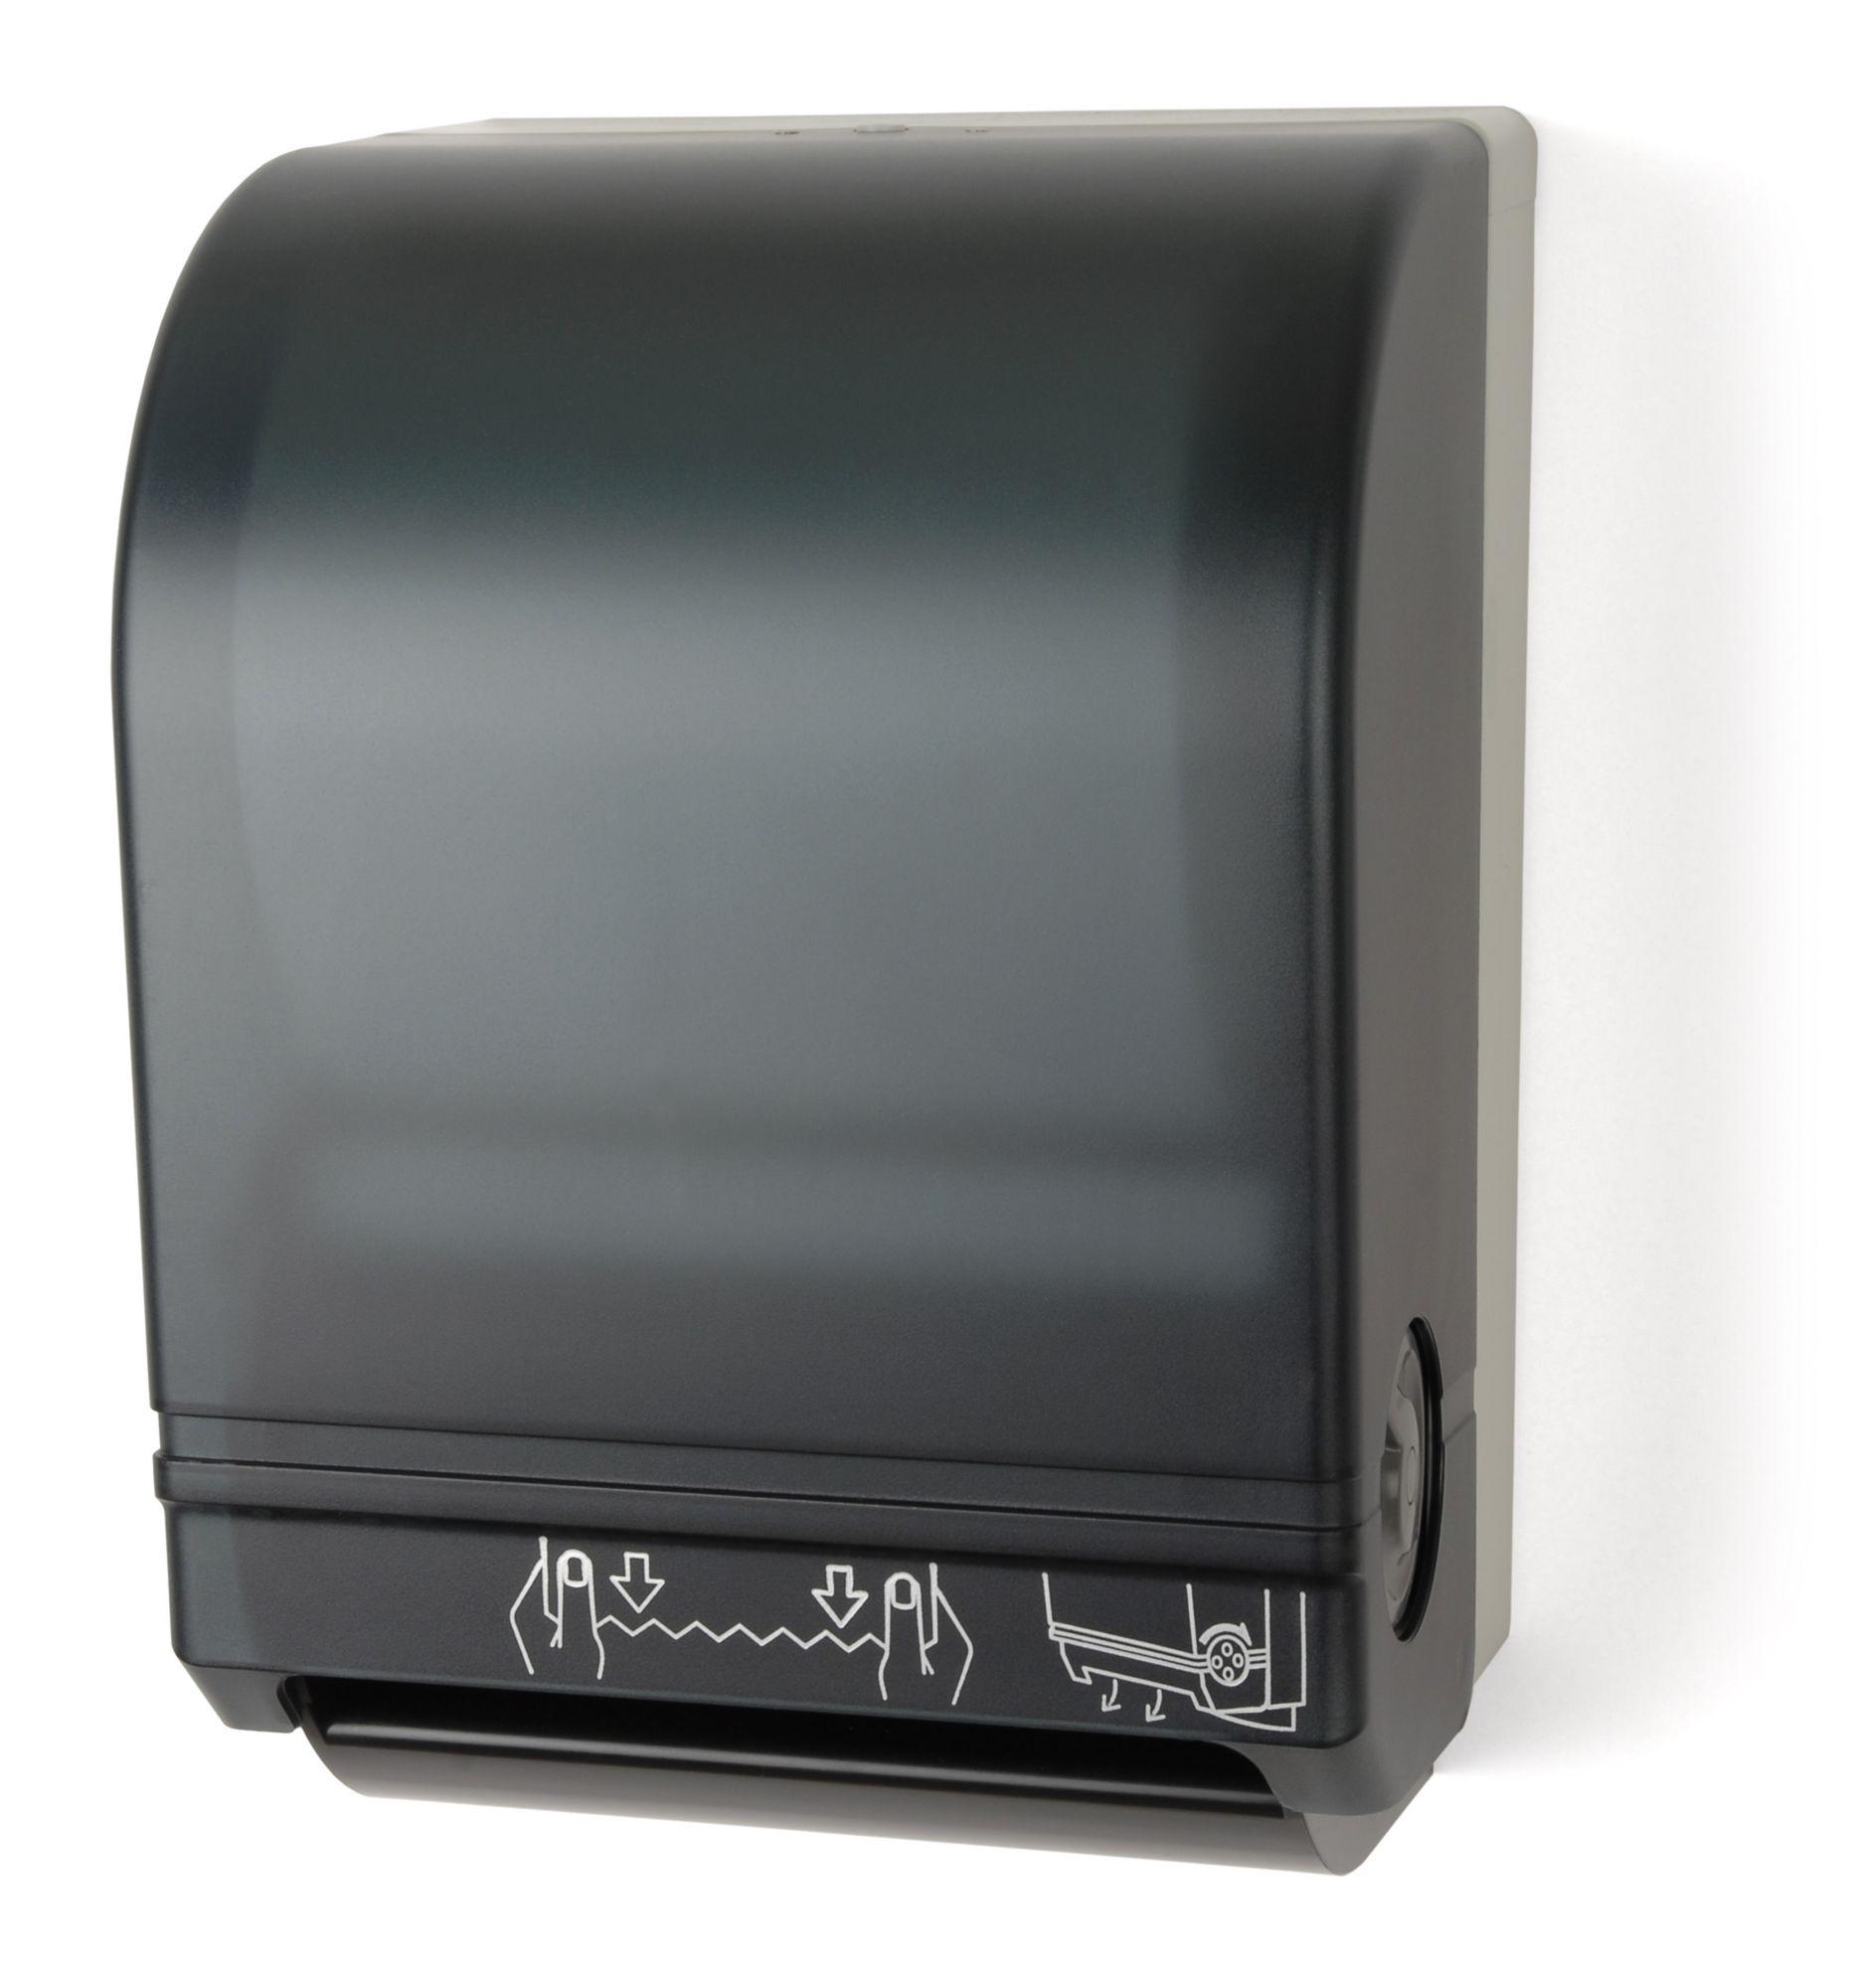 Cardinal Health™ Housekeeping Supplies - Paper towel dispenser